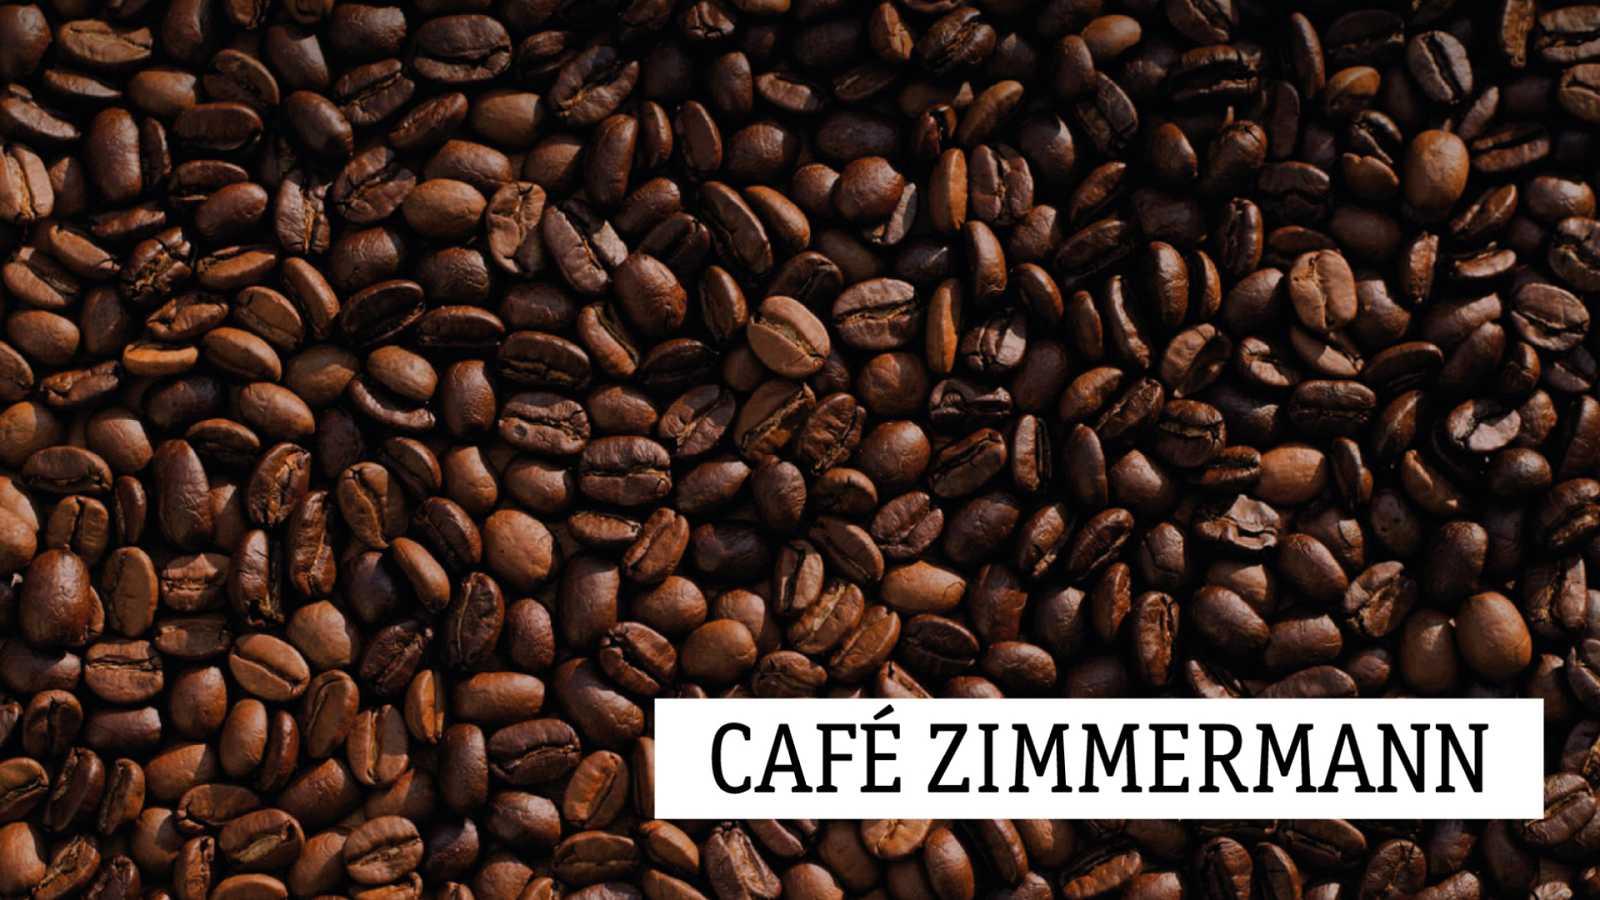 Café Zimmermann - Asier Polo - 05/02/21 - ESCUCHAR AHORA